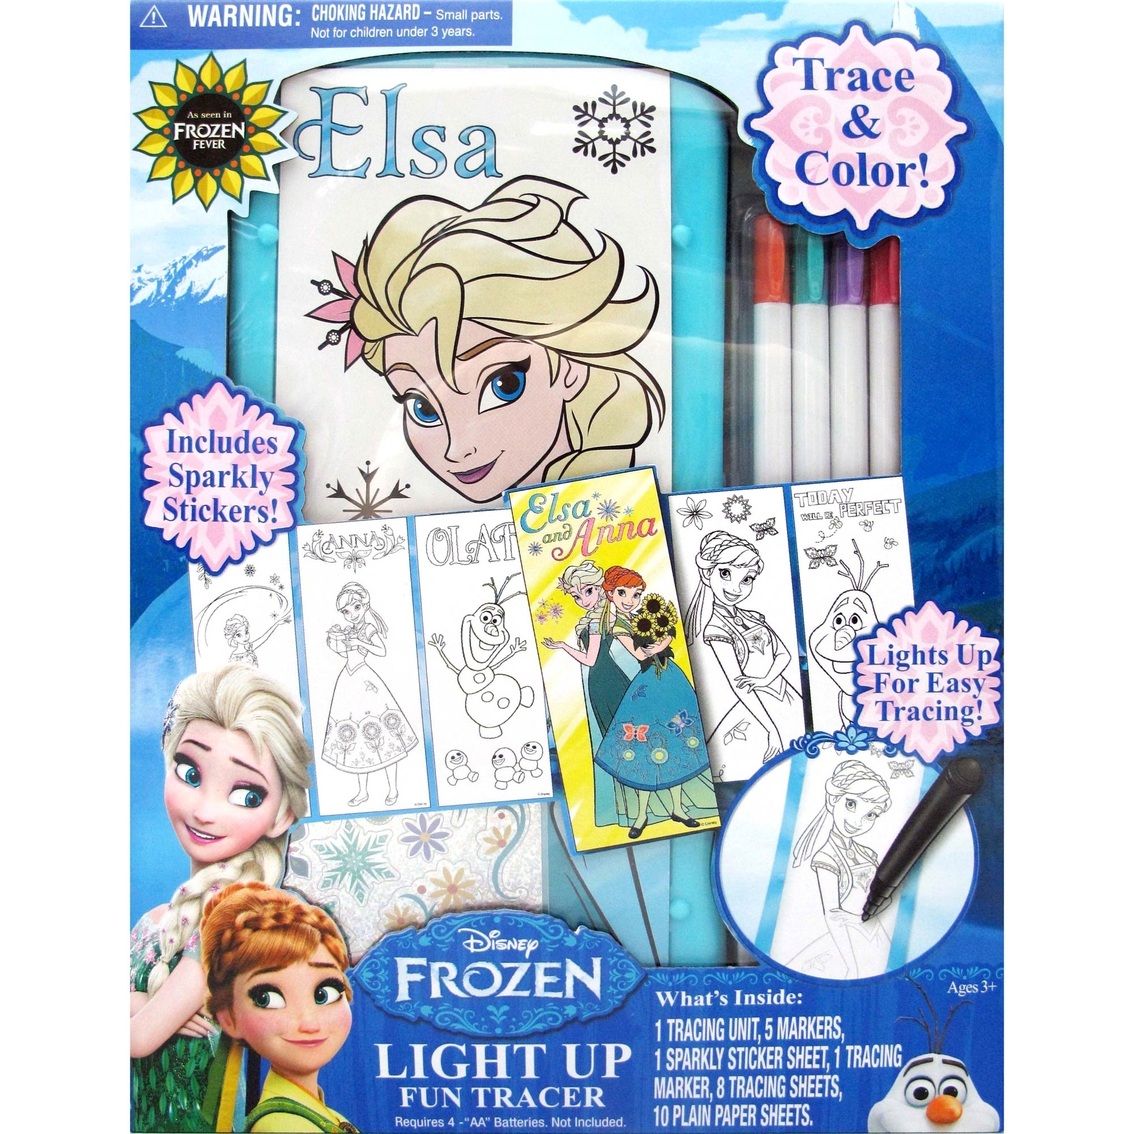 Tara Toy Disney Frozen Light Up Fun Fashion Tracer